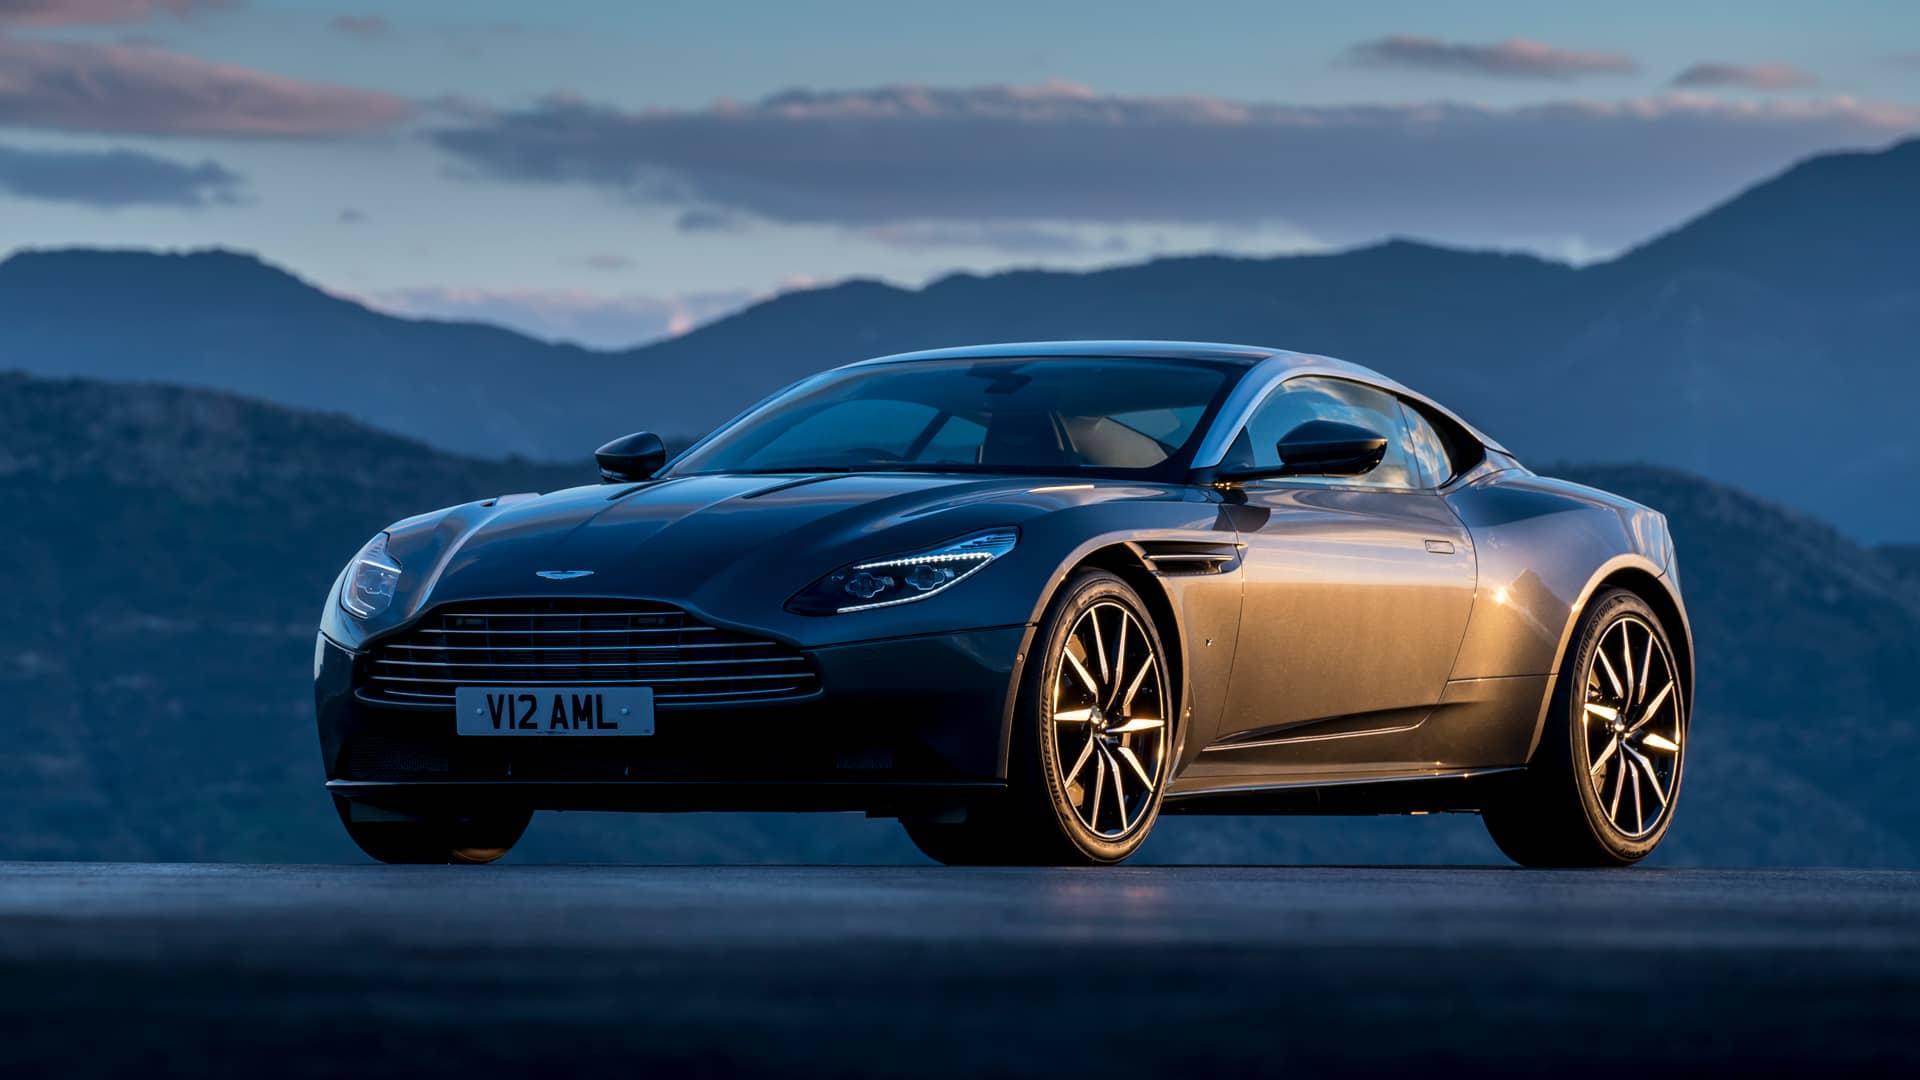 Aston Martin global website